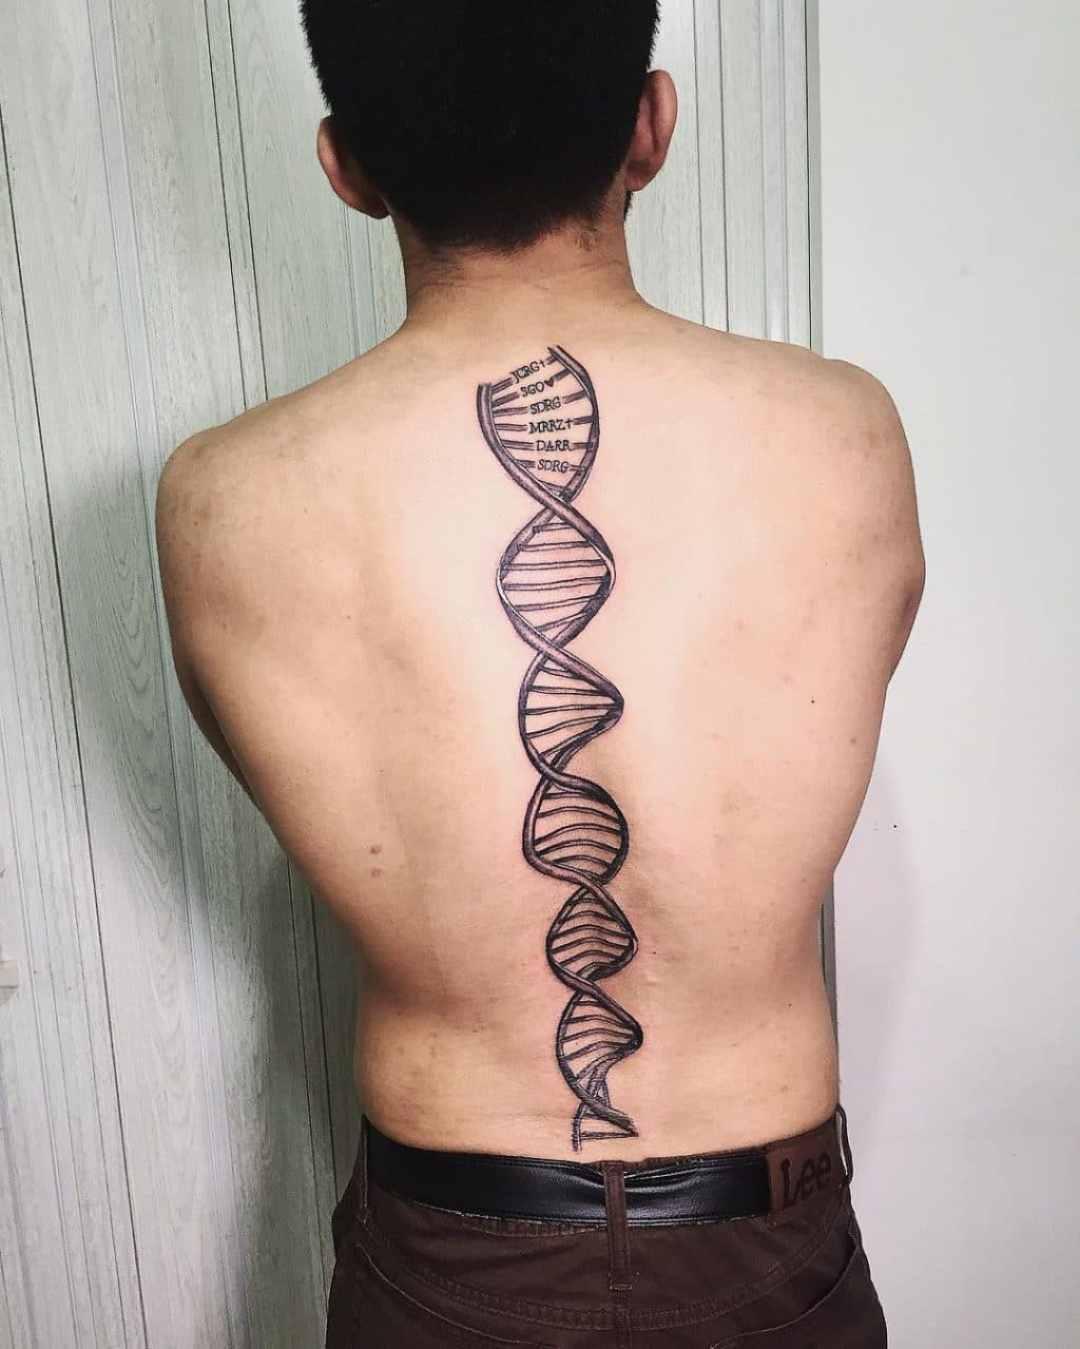 25 Ideas De Tatuajes Para Amantes De La Ciencia Procrastina Fácil